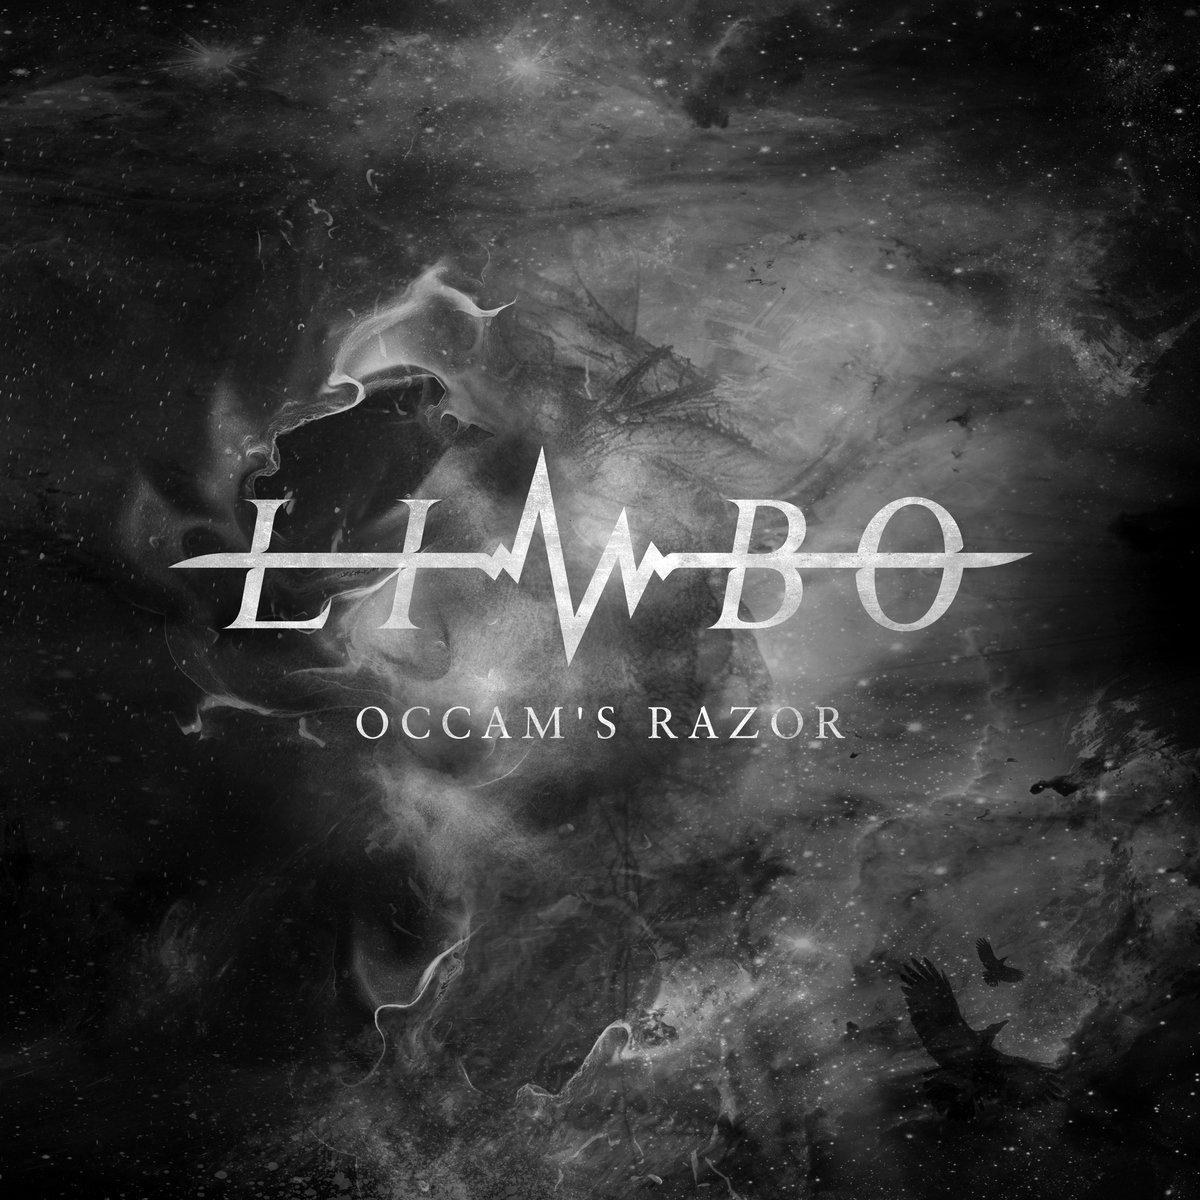 Limbo - Occam's Razor [Single] (2018)